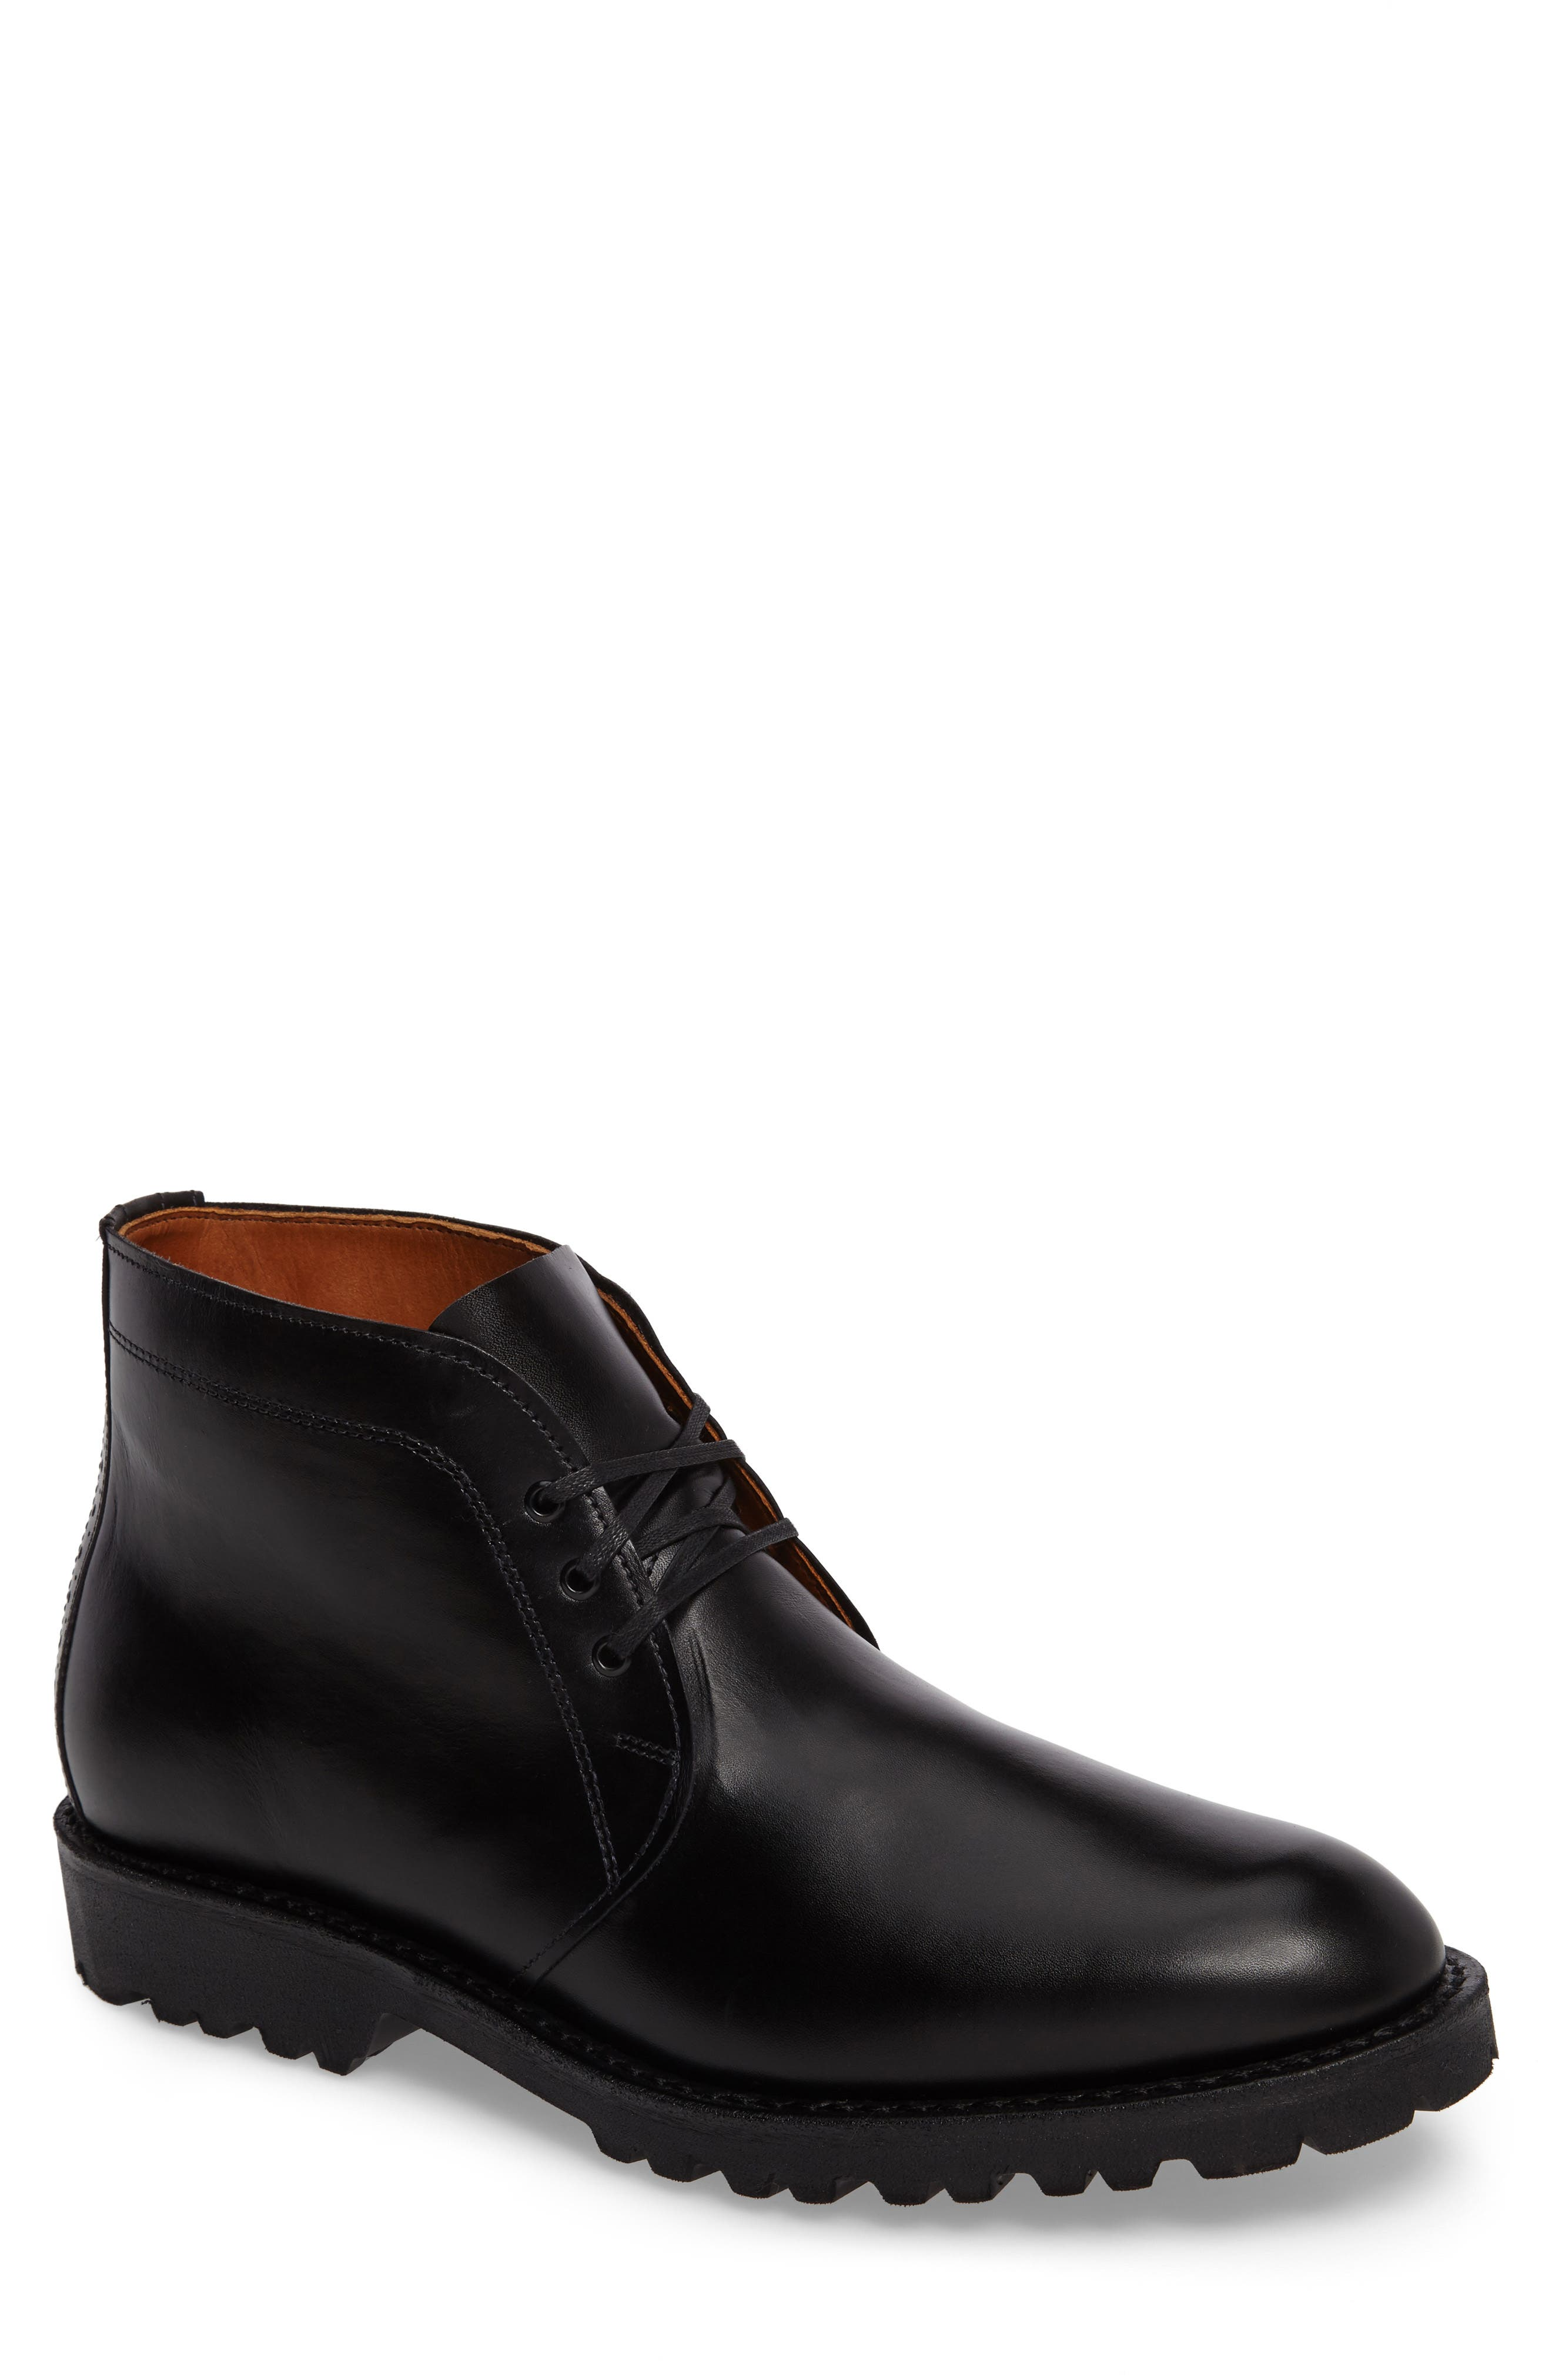 Tate Chukka Boot,                         Main,                         color, Black Leather